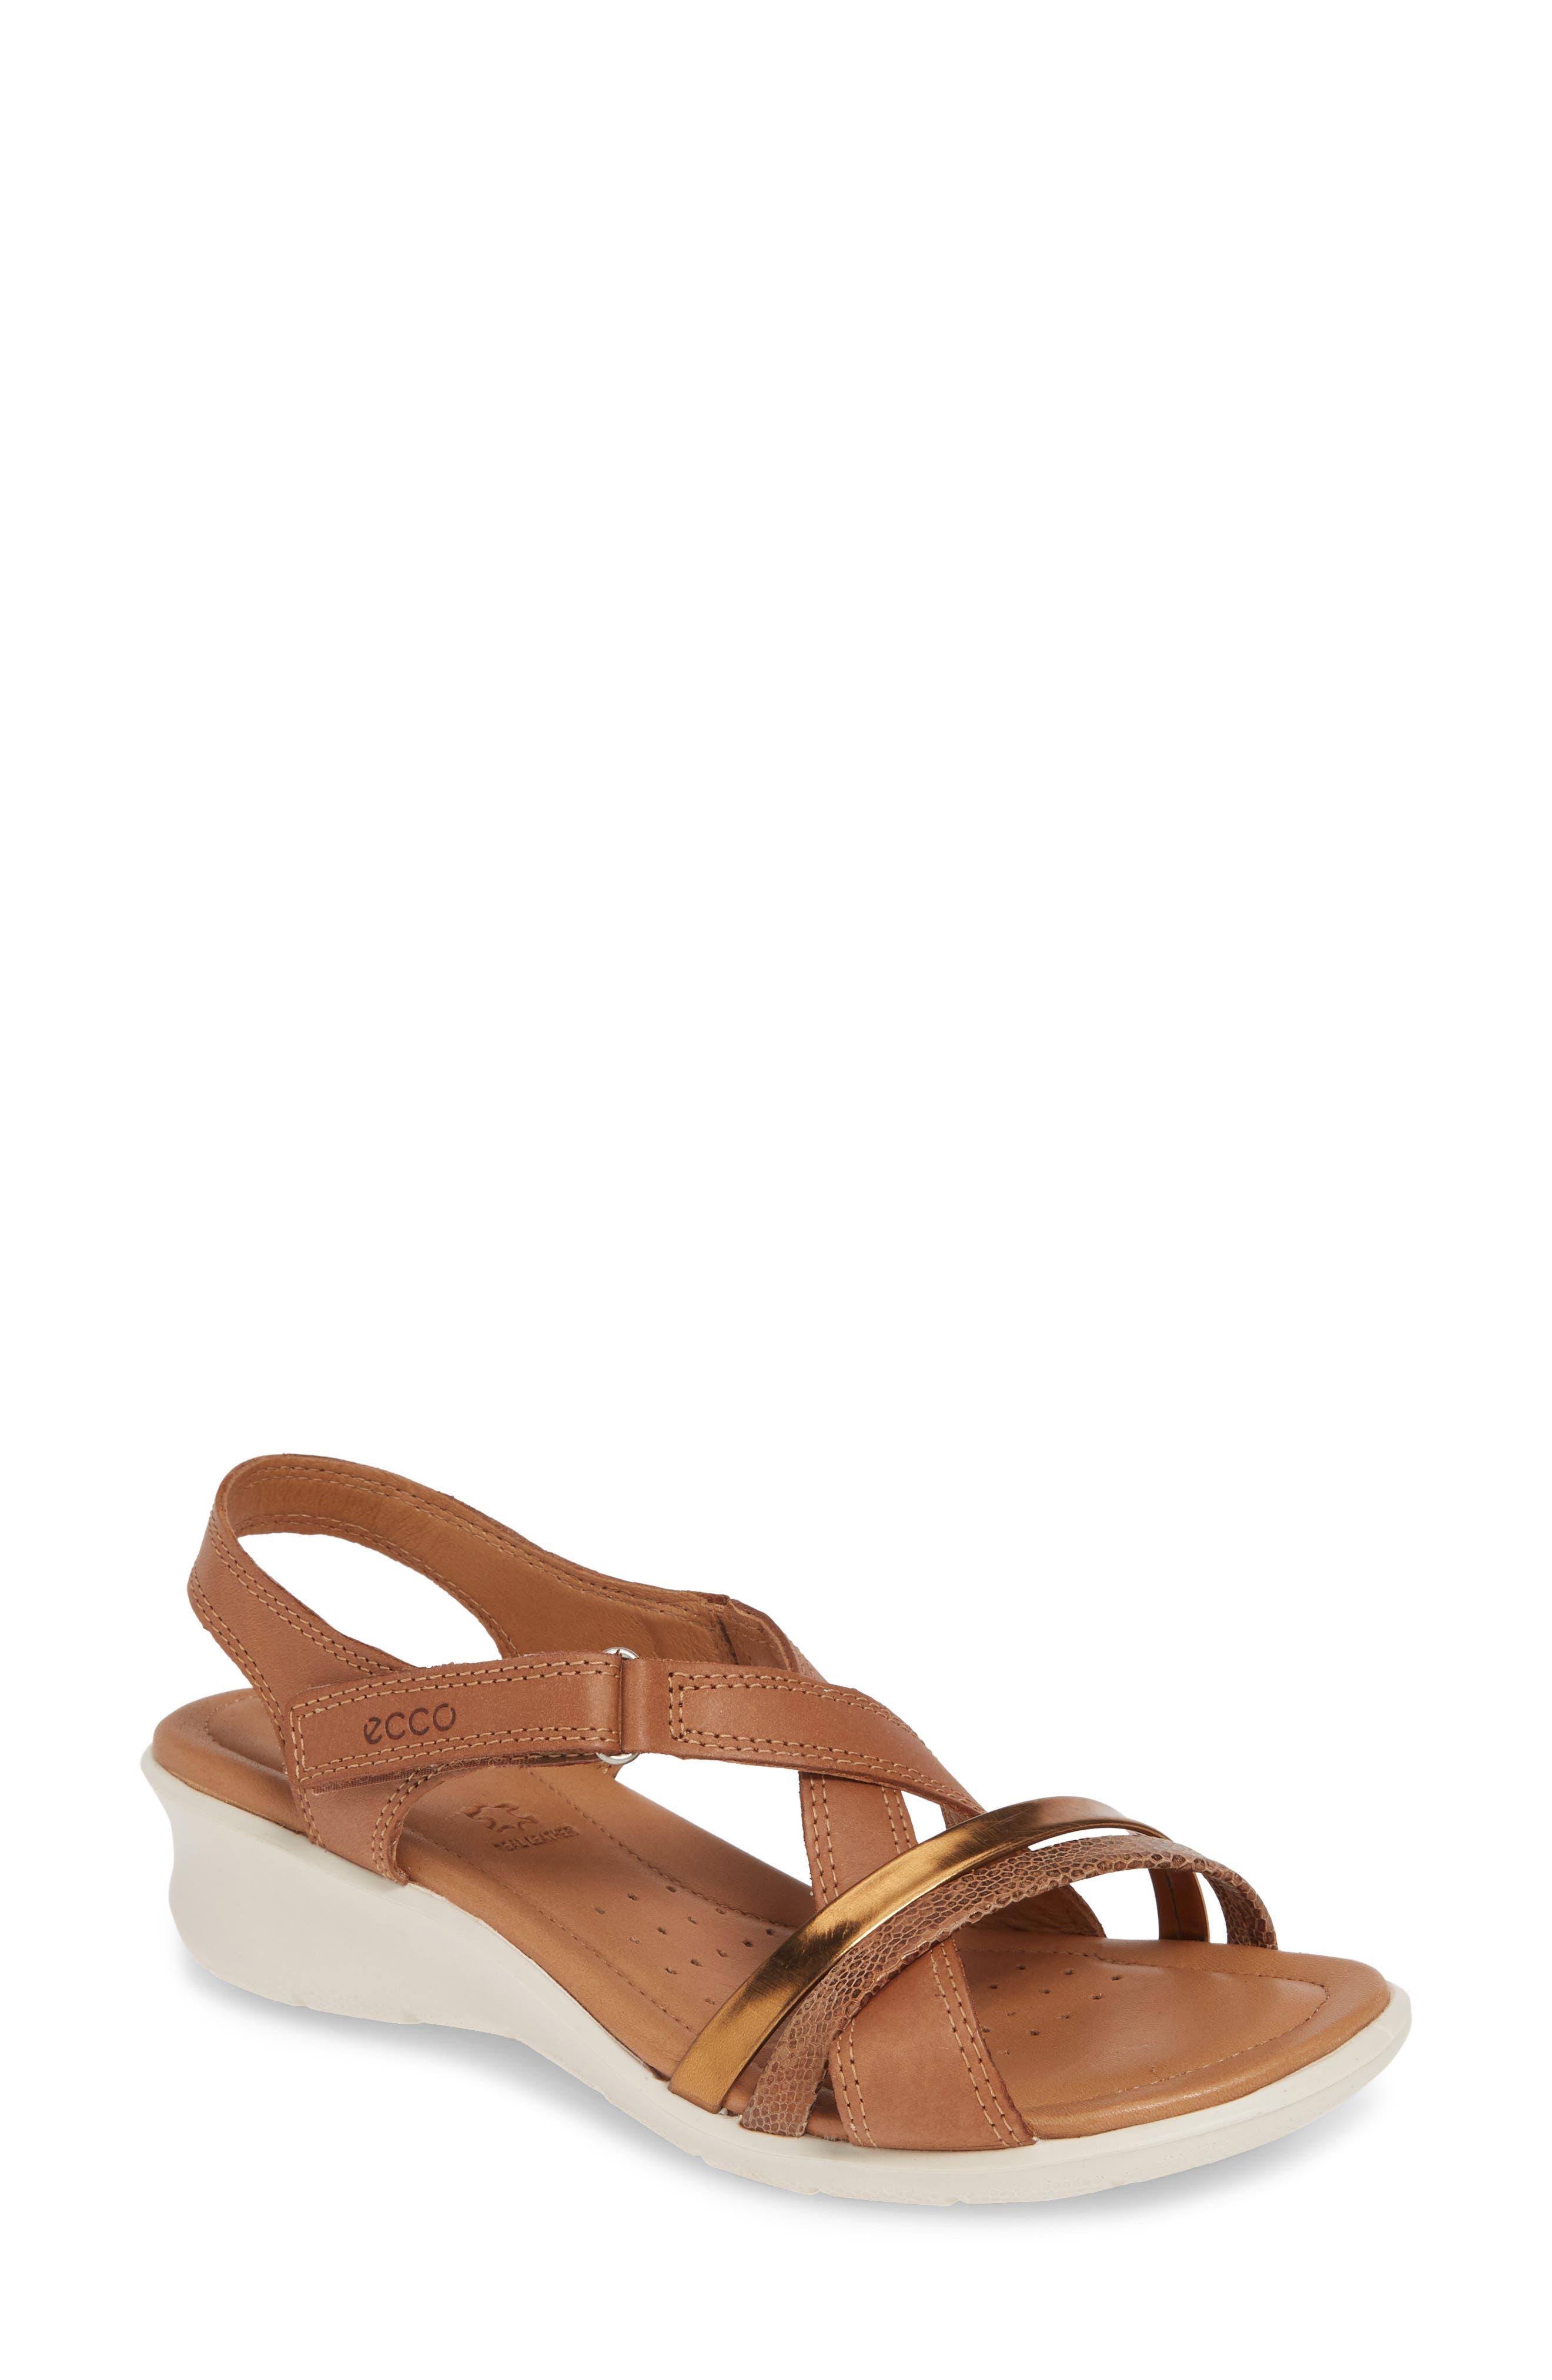 cb2208c20cddd Women's ECCO Shoes | Nordstrom